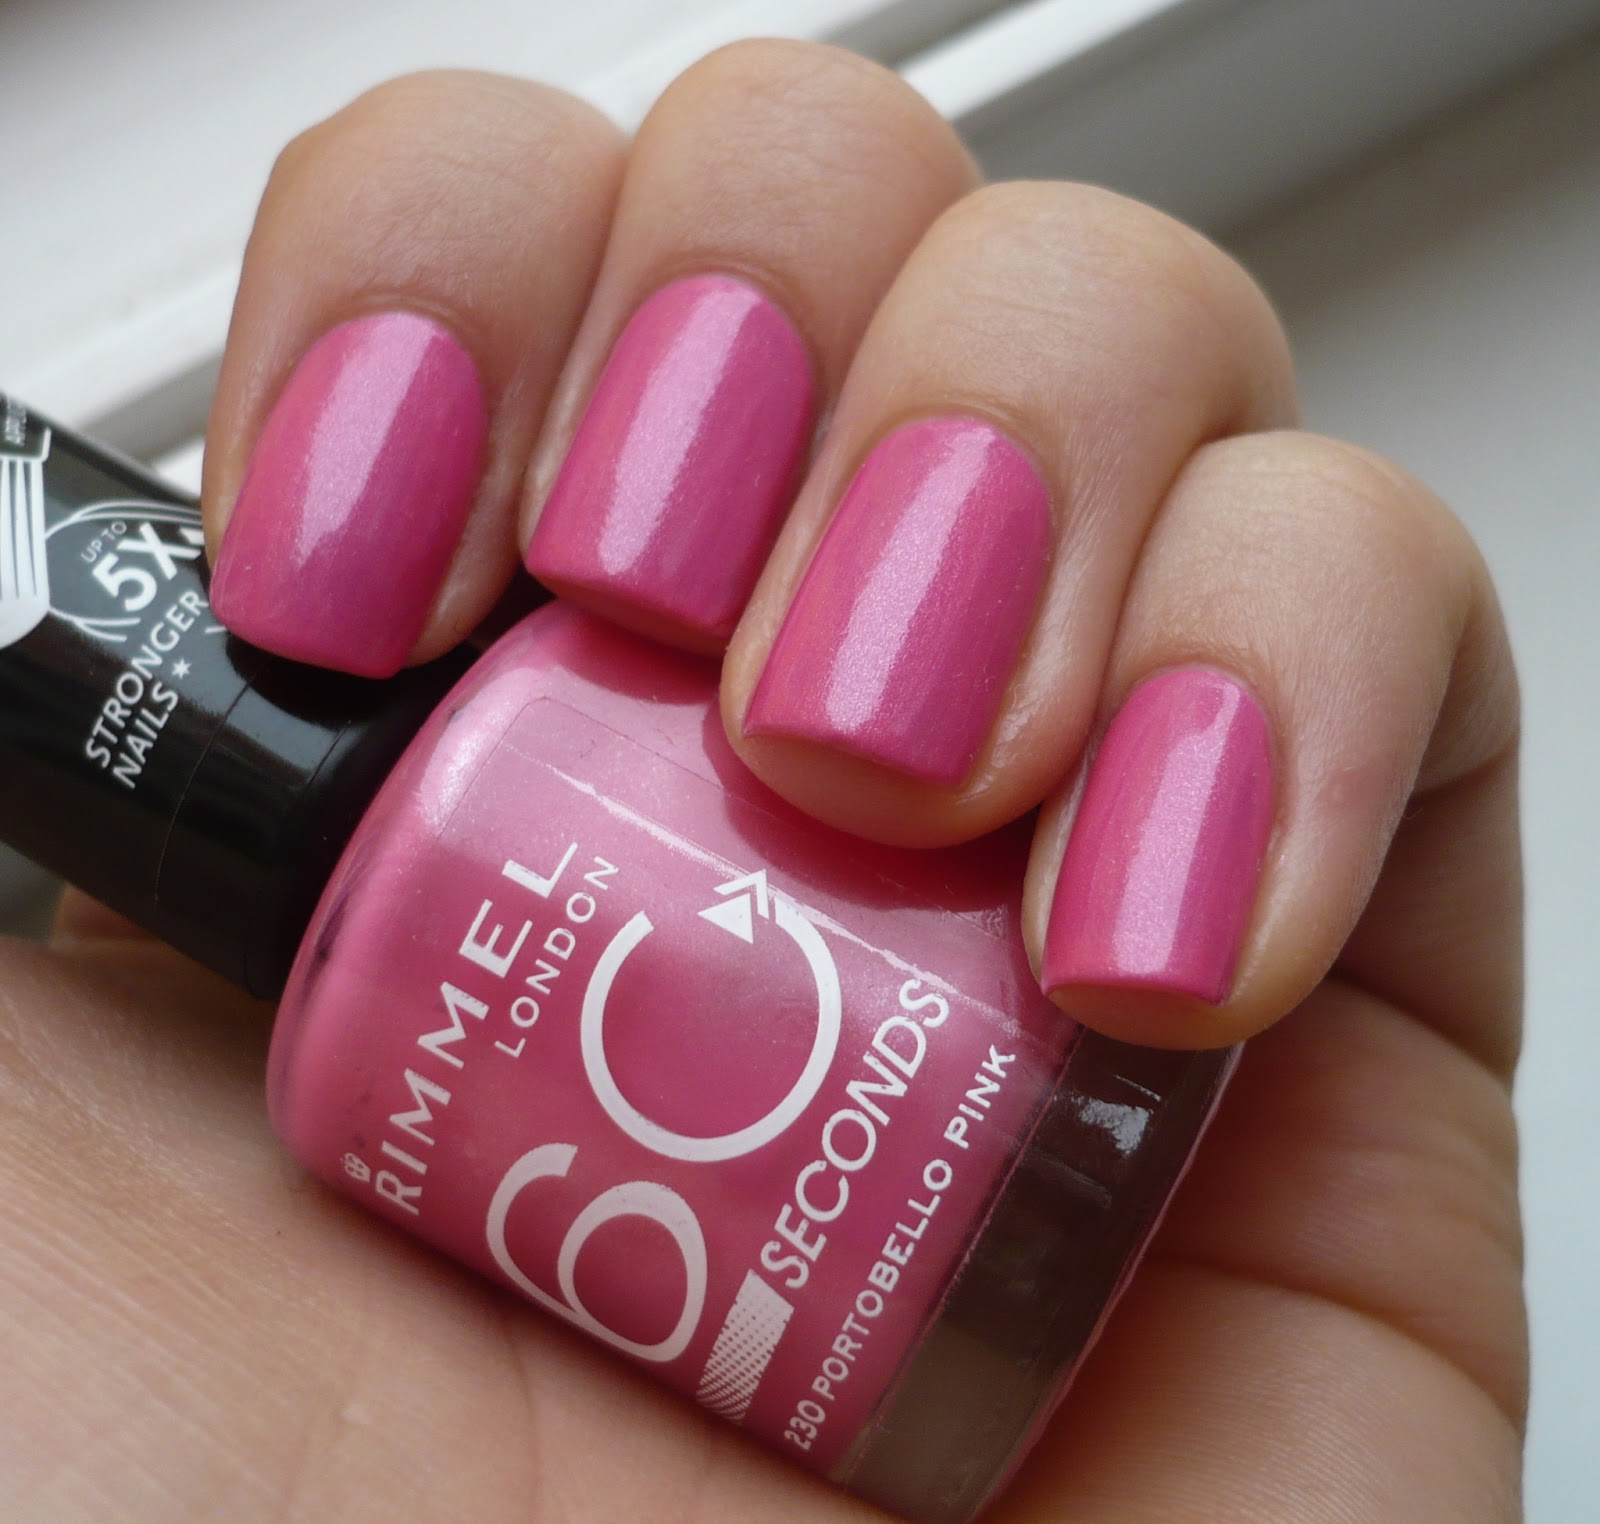 Spiced Chocolate Blog Lak Na Nehty Rimmel 60 Seconds 230 Portobello Pink